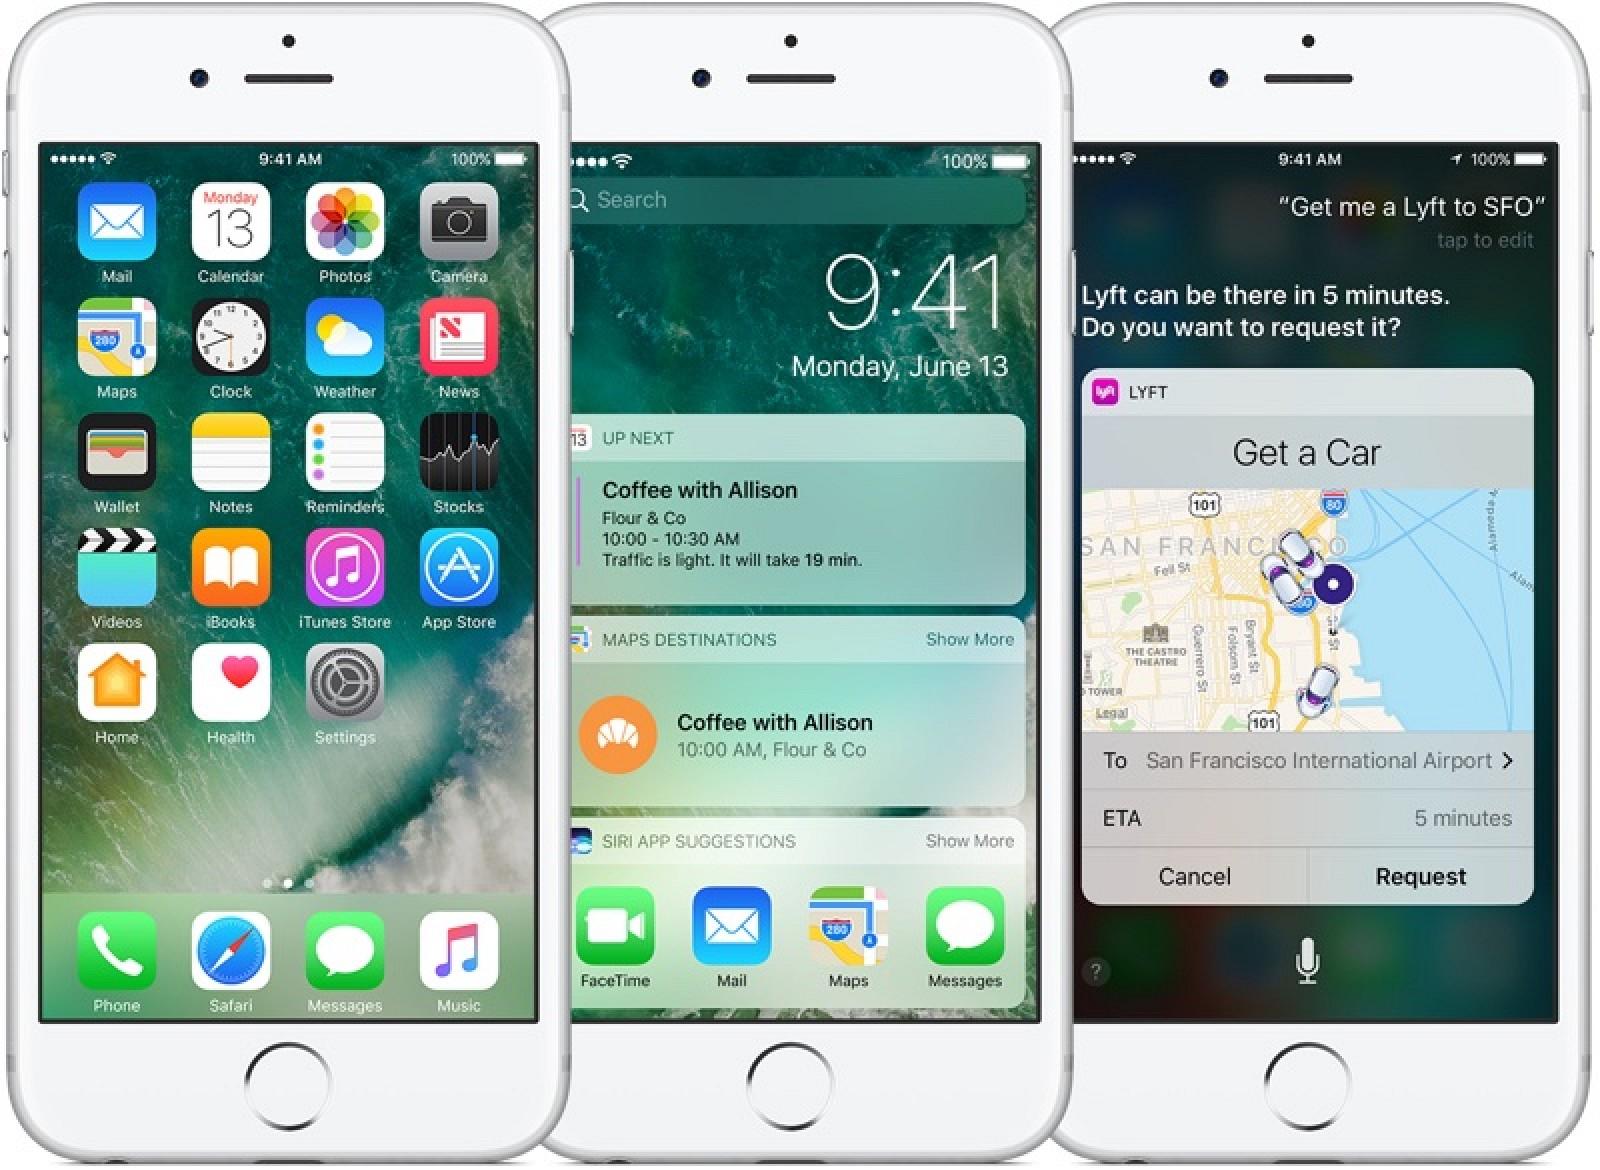 Tại sao iPhone không bao giờ hỗ trợ 2 SIM? 9